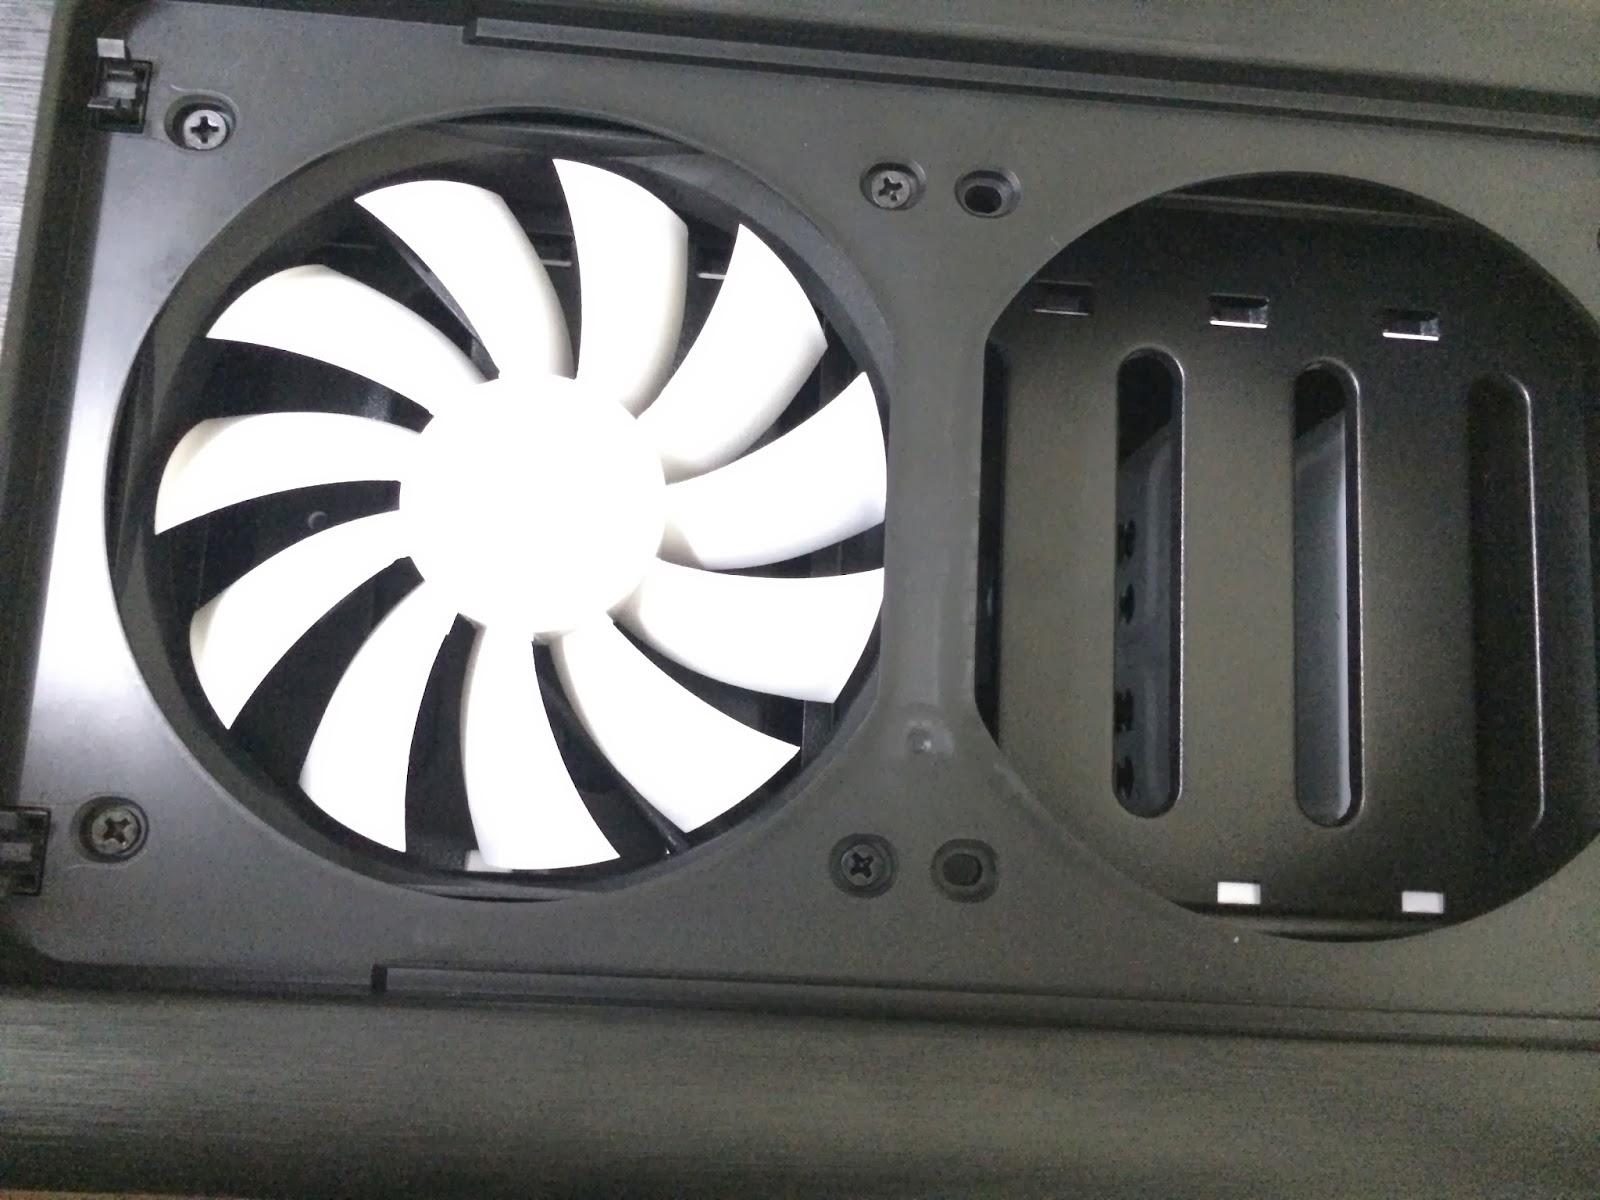 Fractal Design Arc Mini R2 120